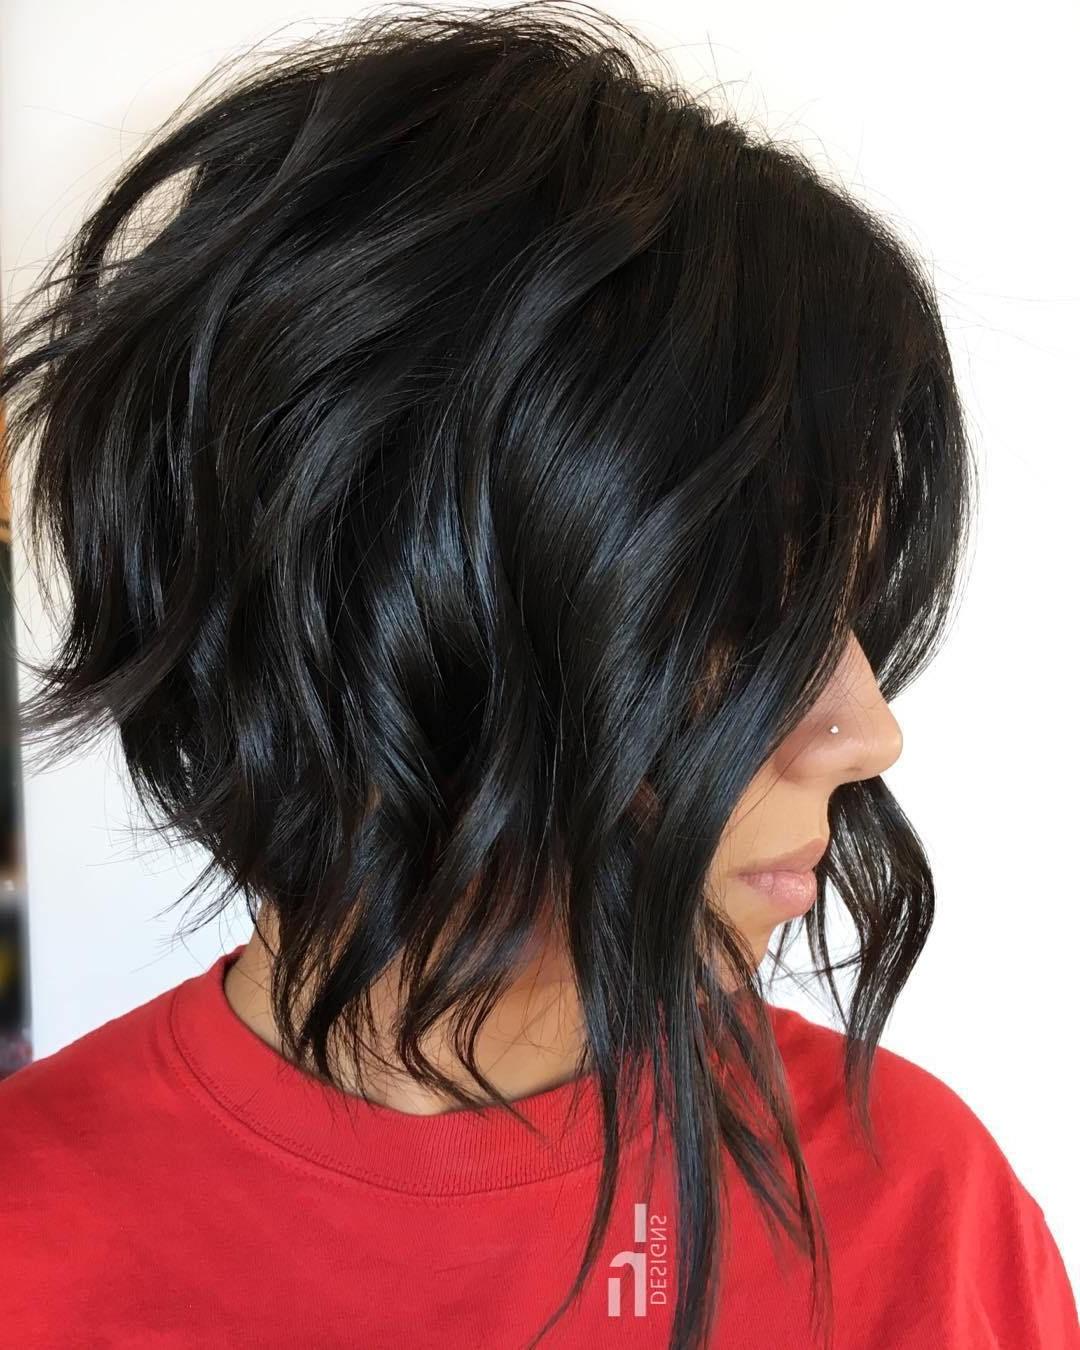 Short Wavy Hair (View 4 of 20)